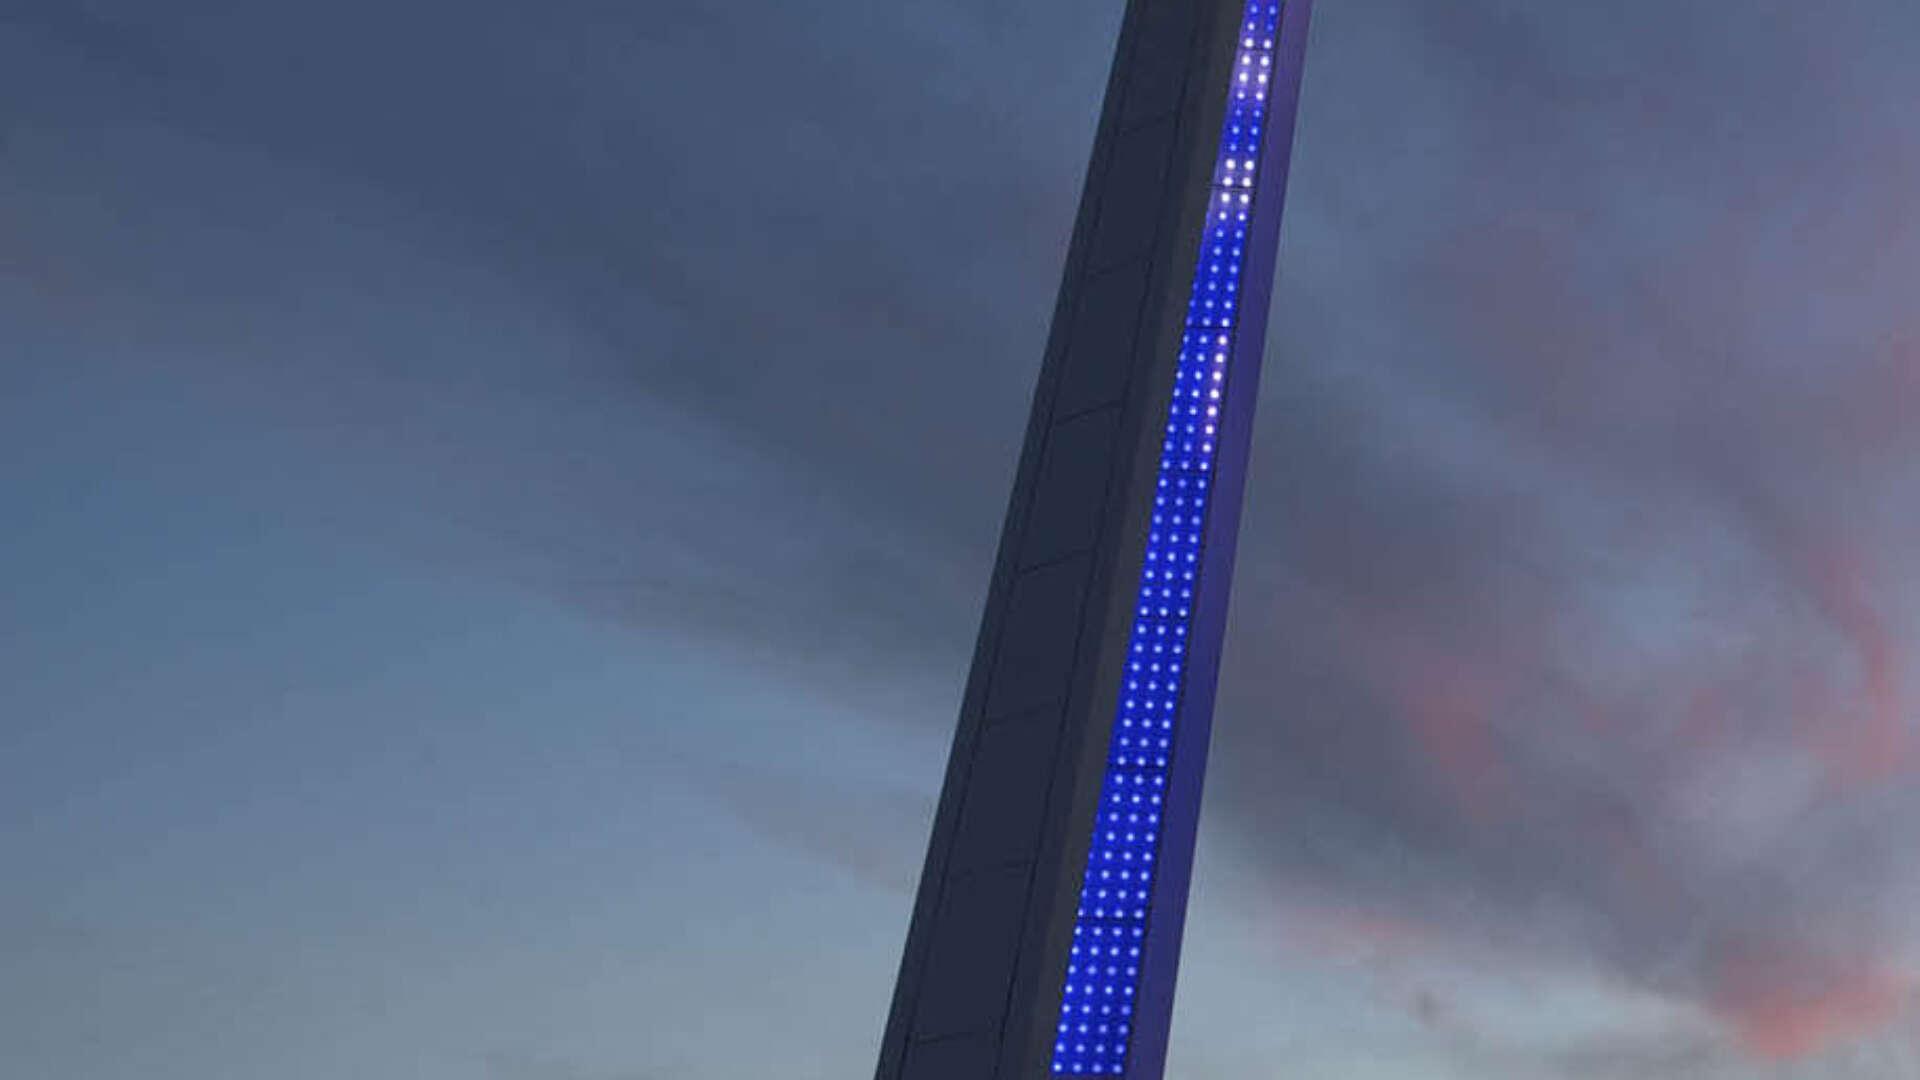 Custom designed lighting masts